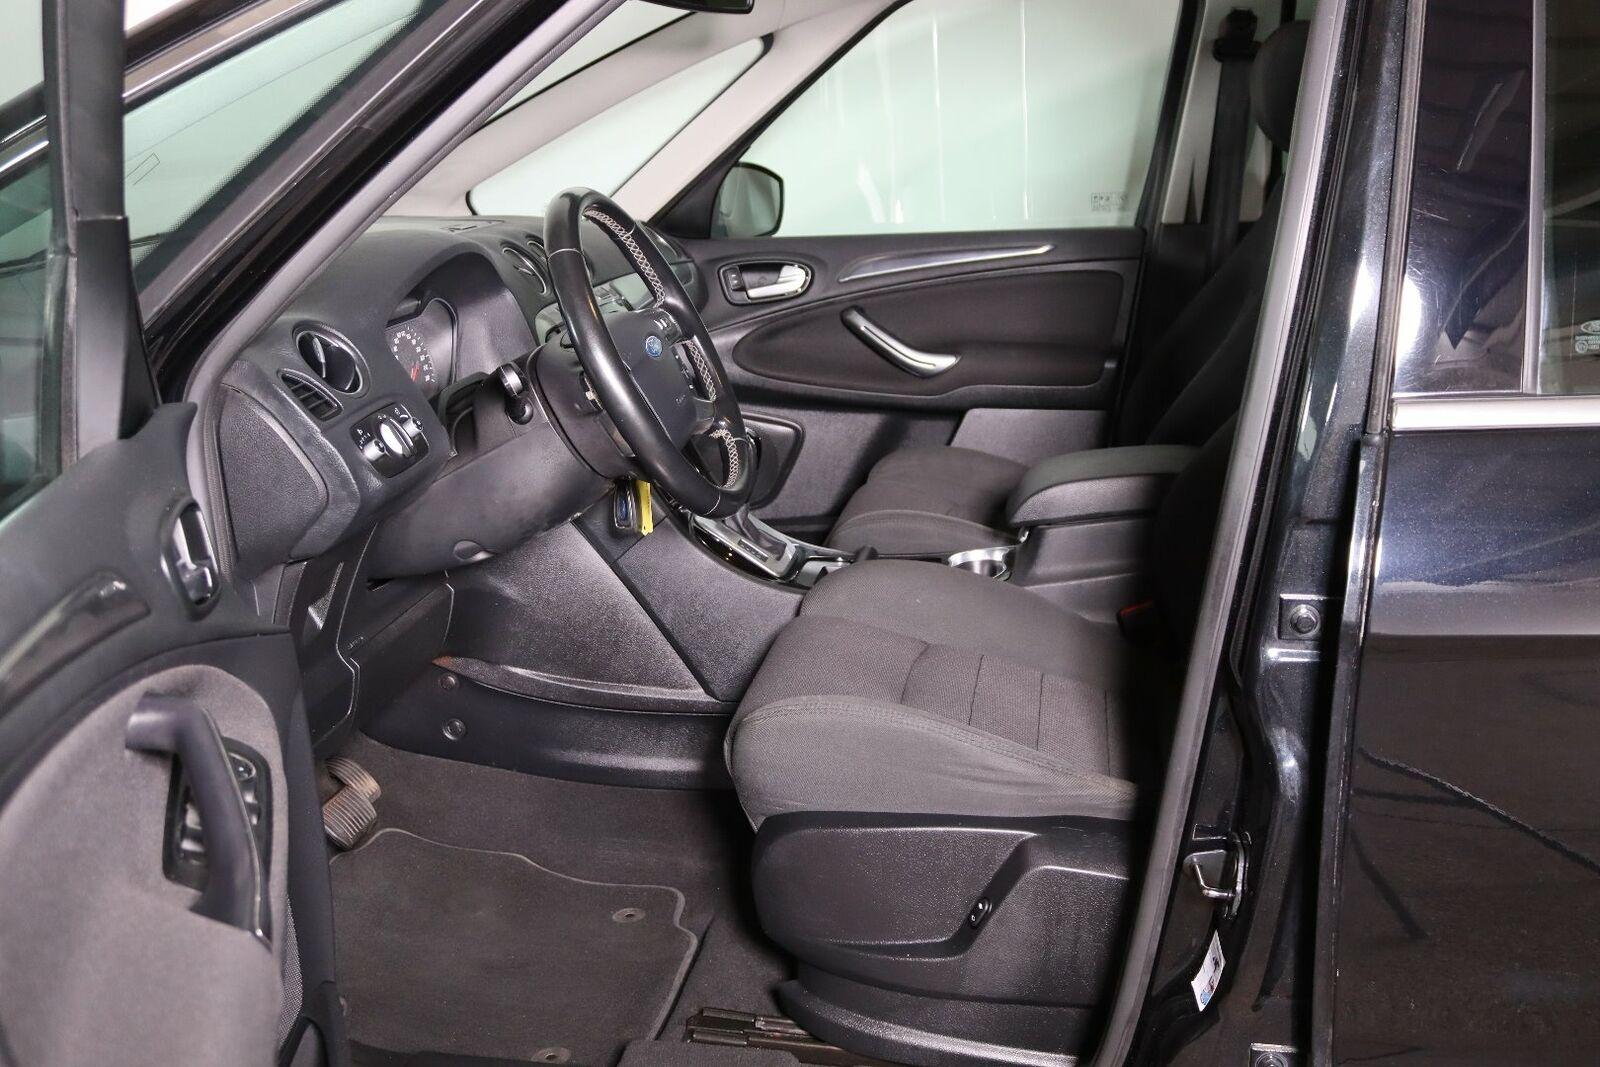 Ford S-MAX 2,0 TDCi 163 Titanium aut. 7prs - billede 9